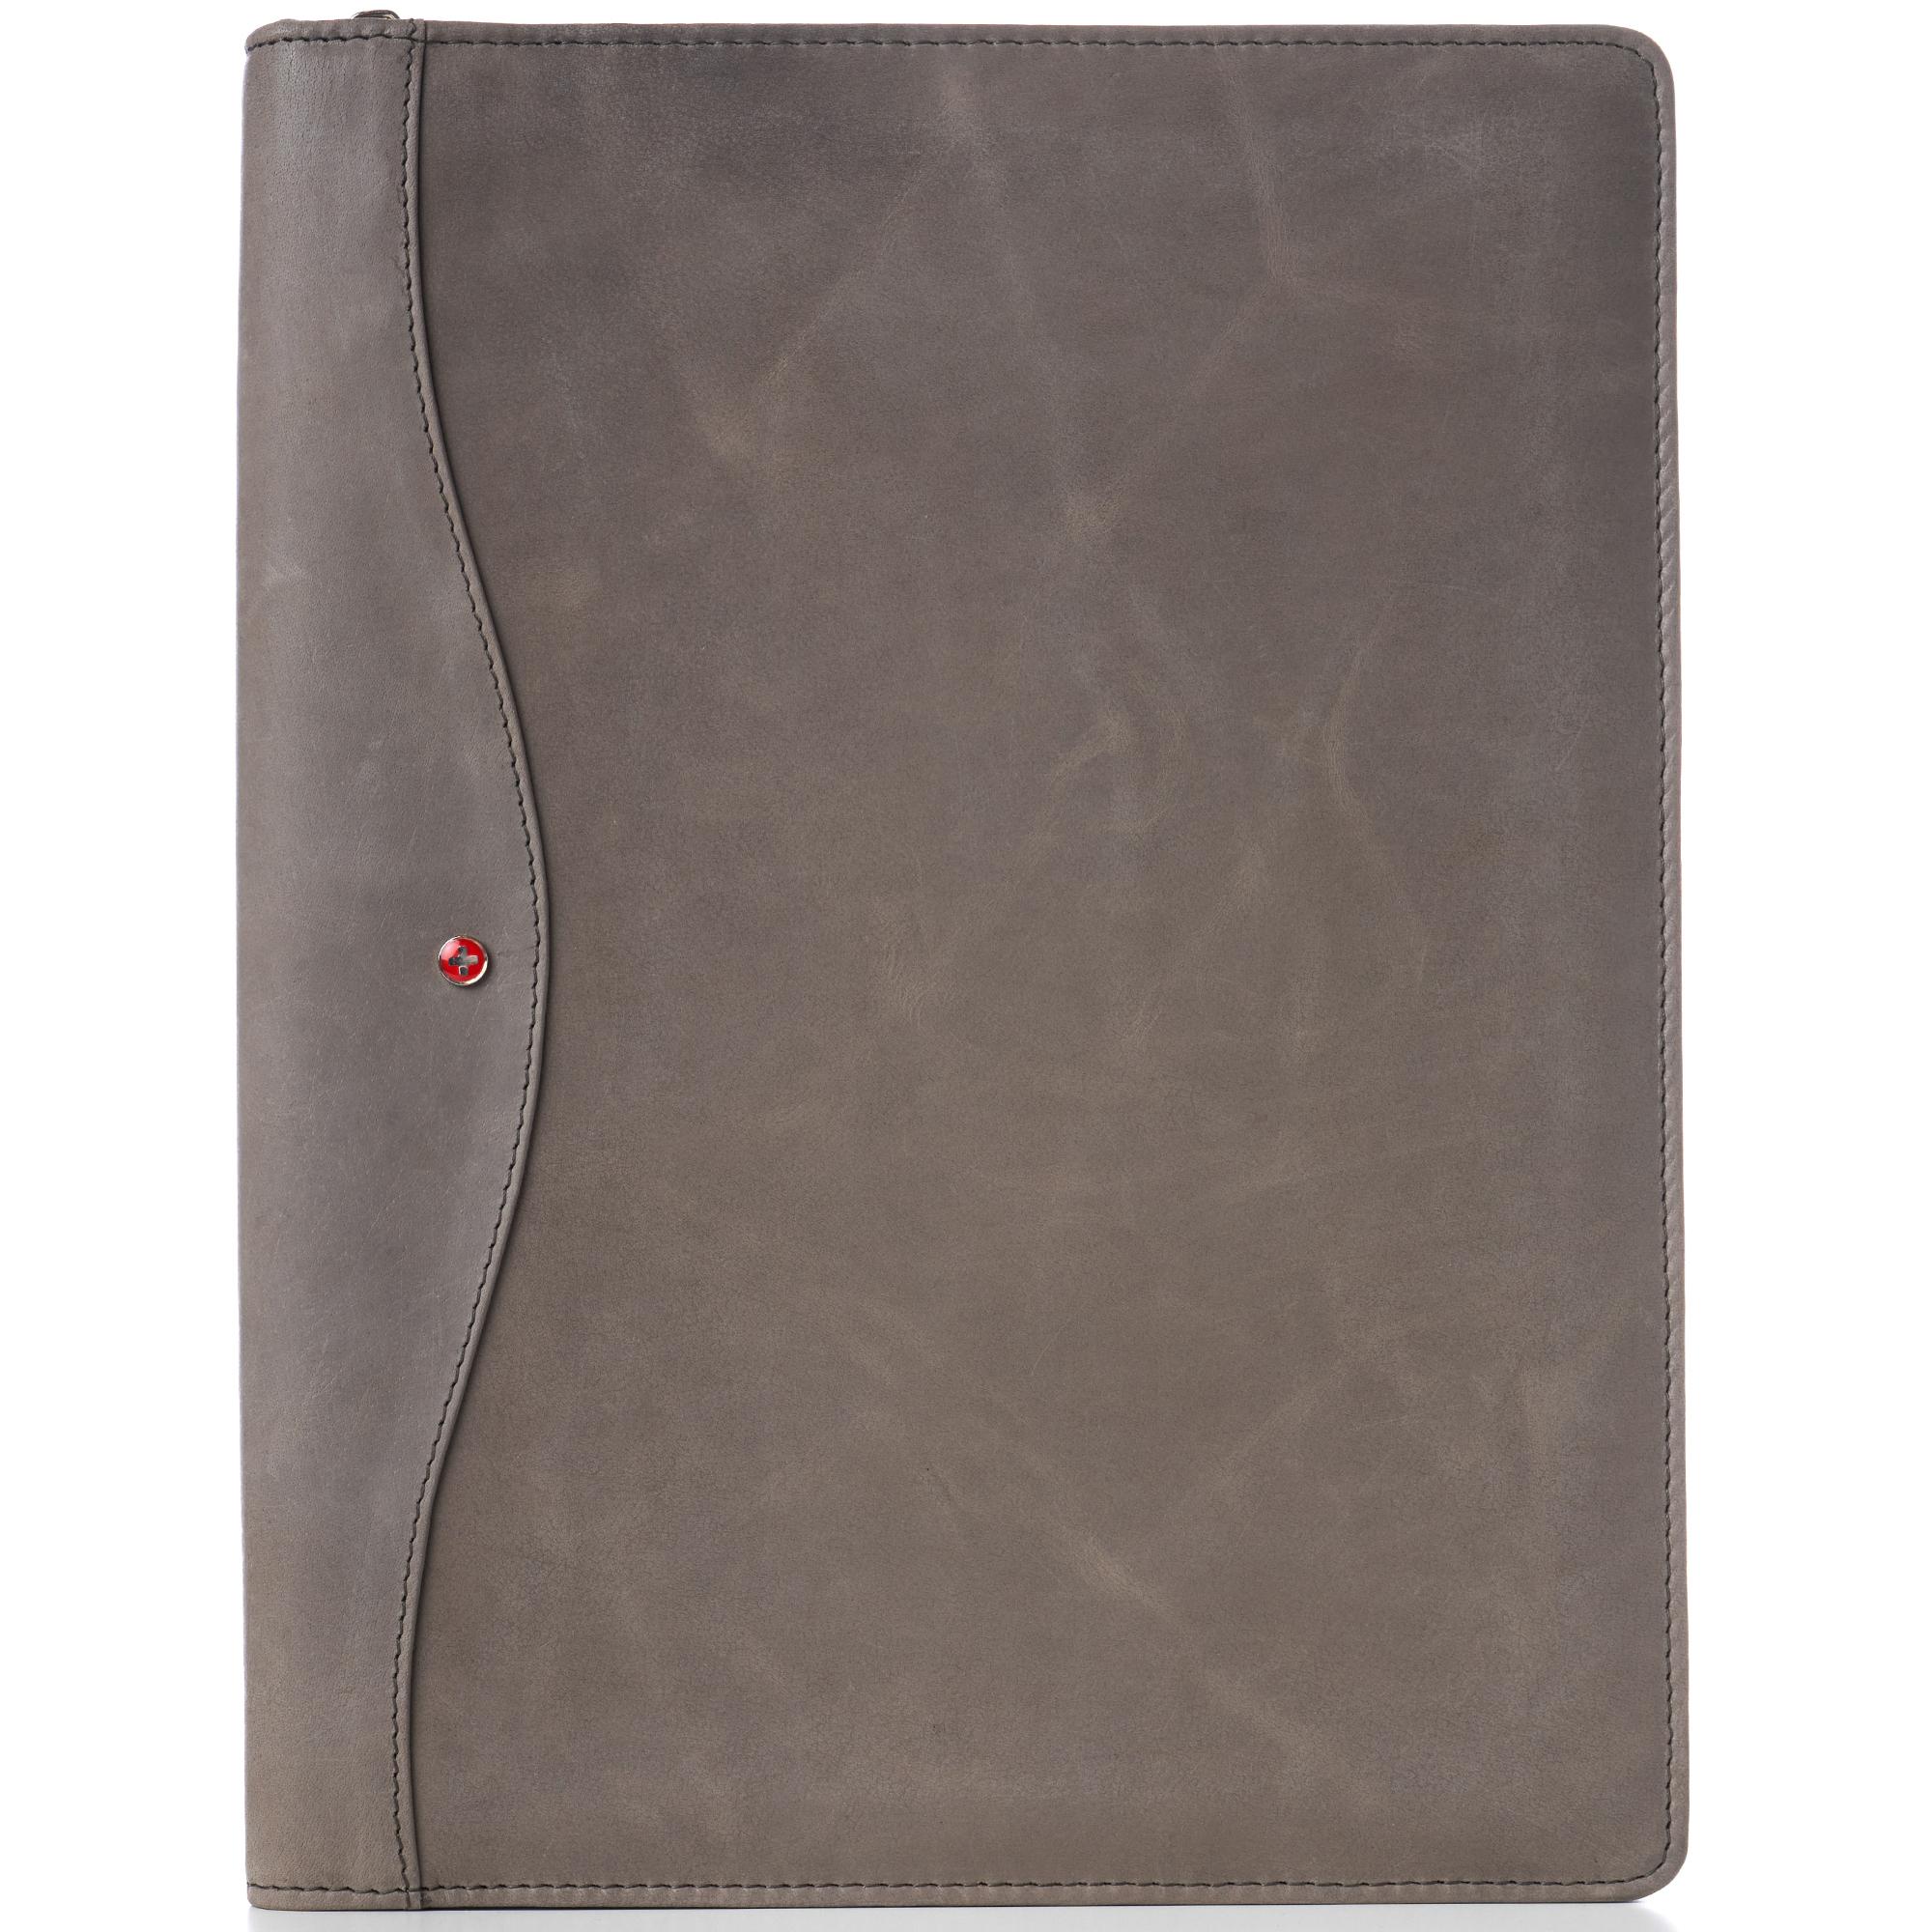 thumbnail 36 - Alpine Swiss Leather Zippered Writing Pad Portfolio Business Briefcase Organizer